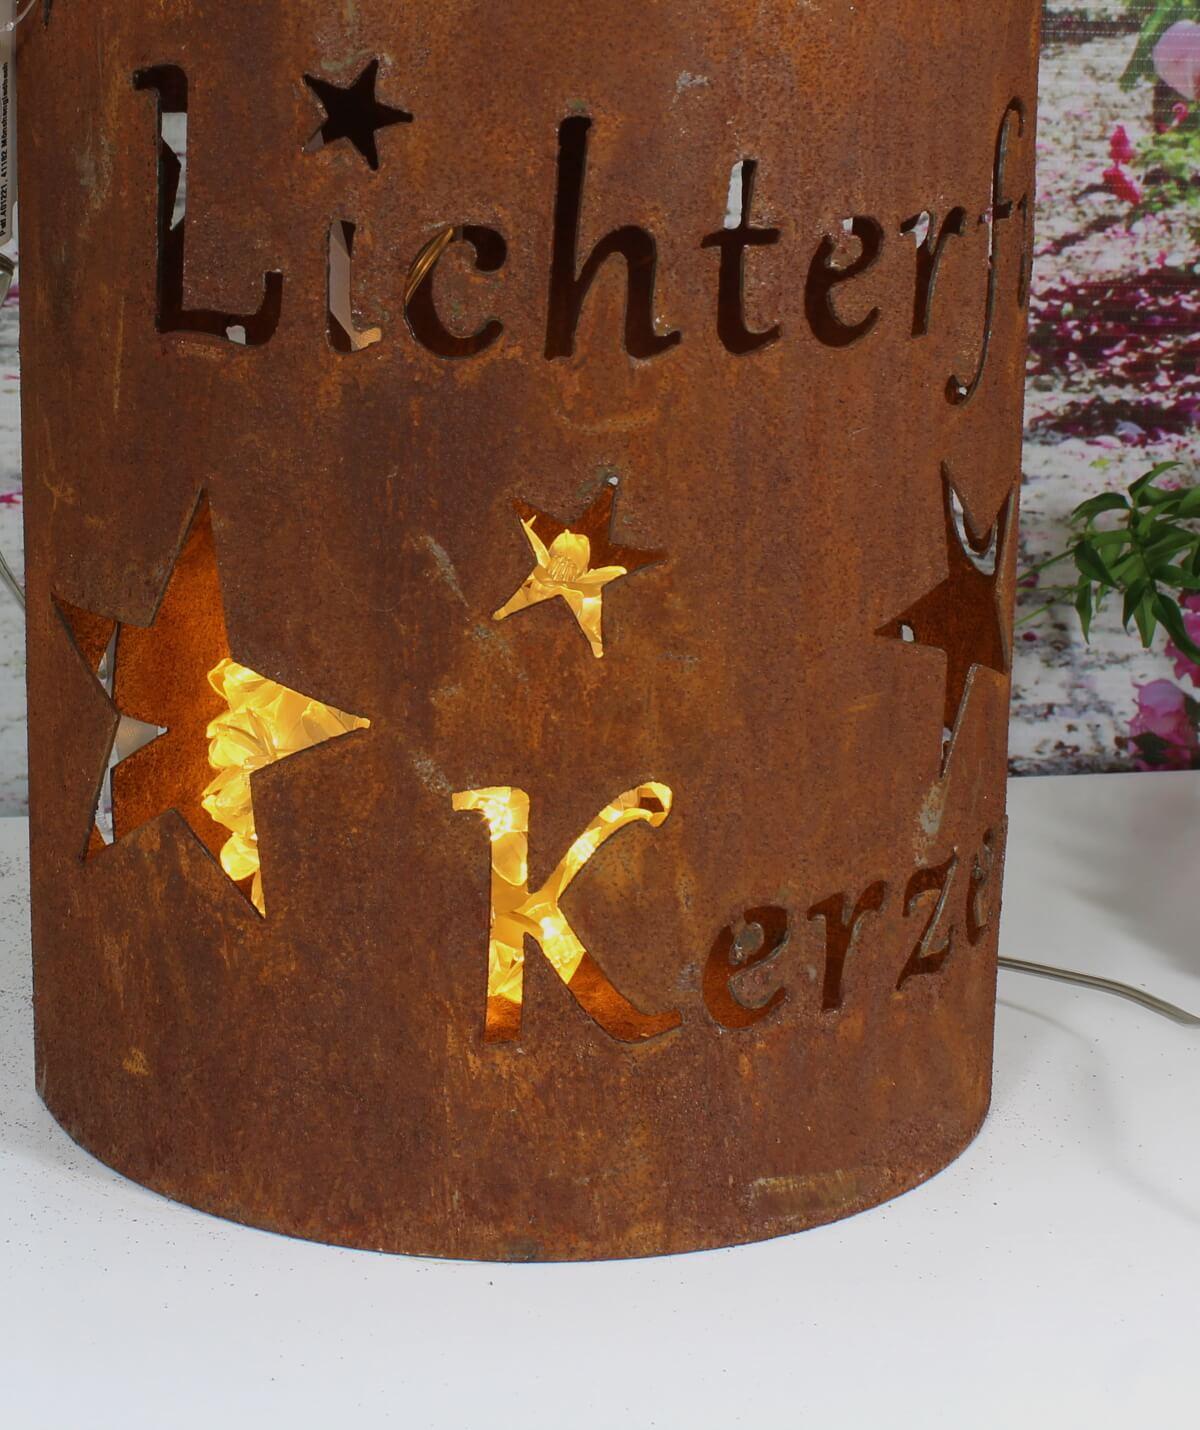 Windlicht Kerzenhalter Im Rost Design Elfengarten Shop